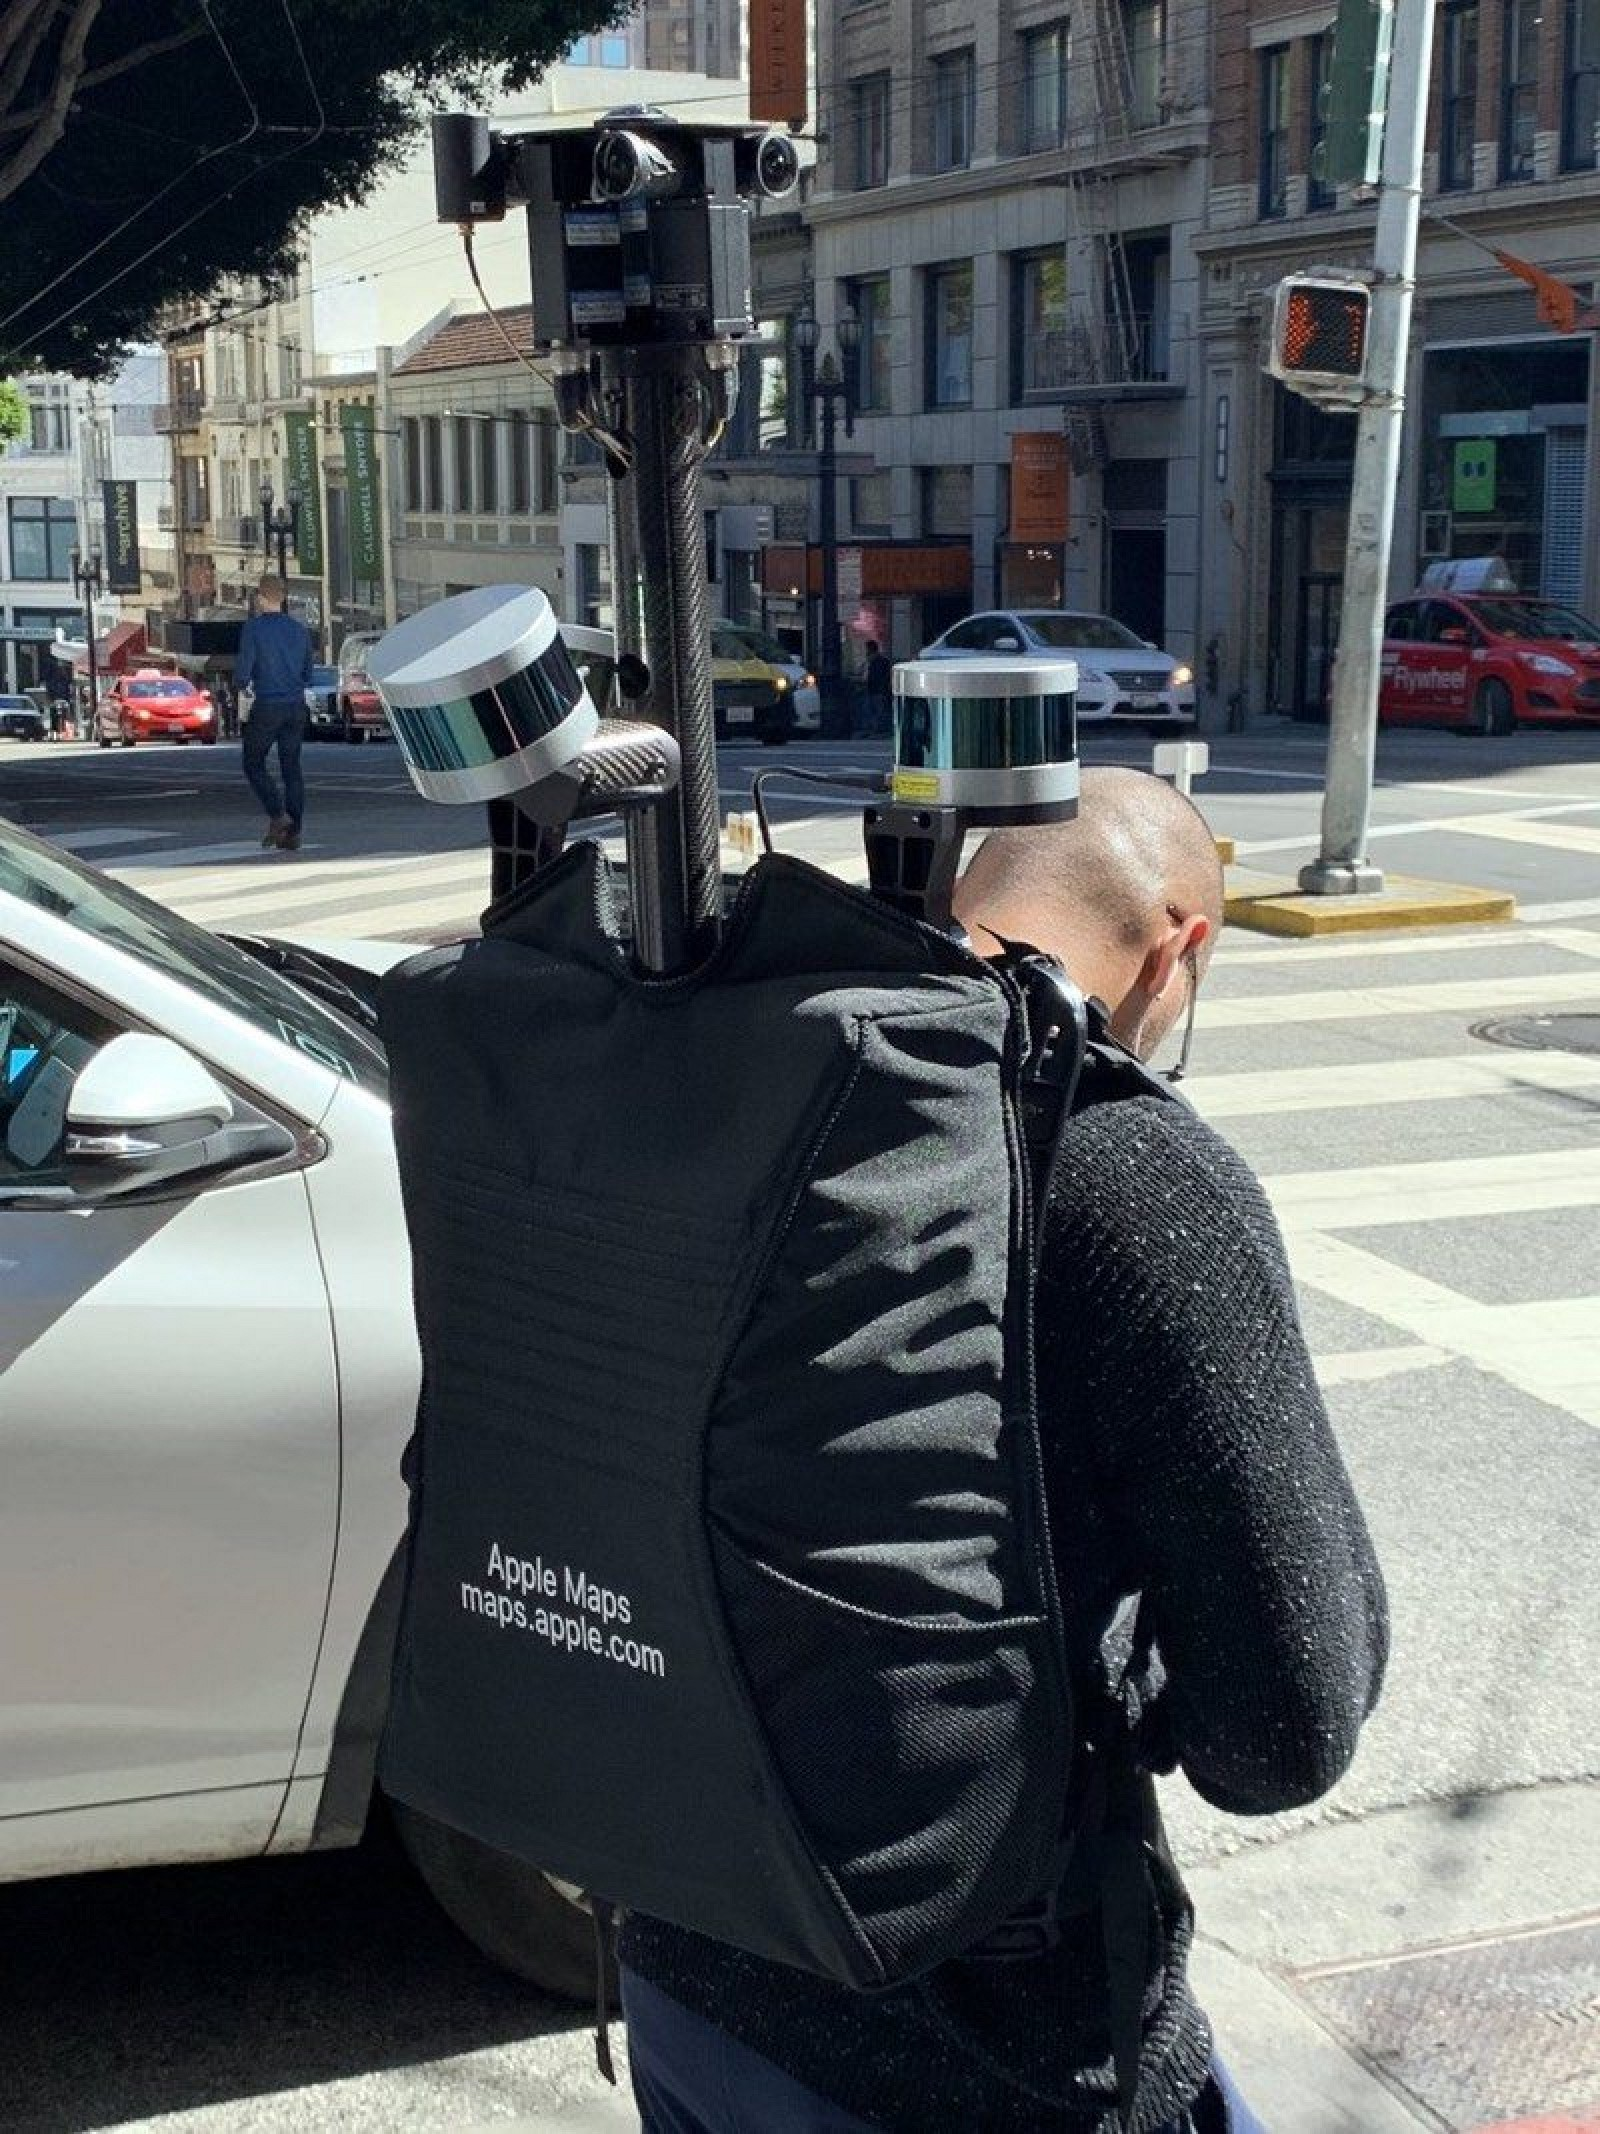 Man Wearing Apple Maps Backpack Surveying San Francisco on Foot